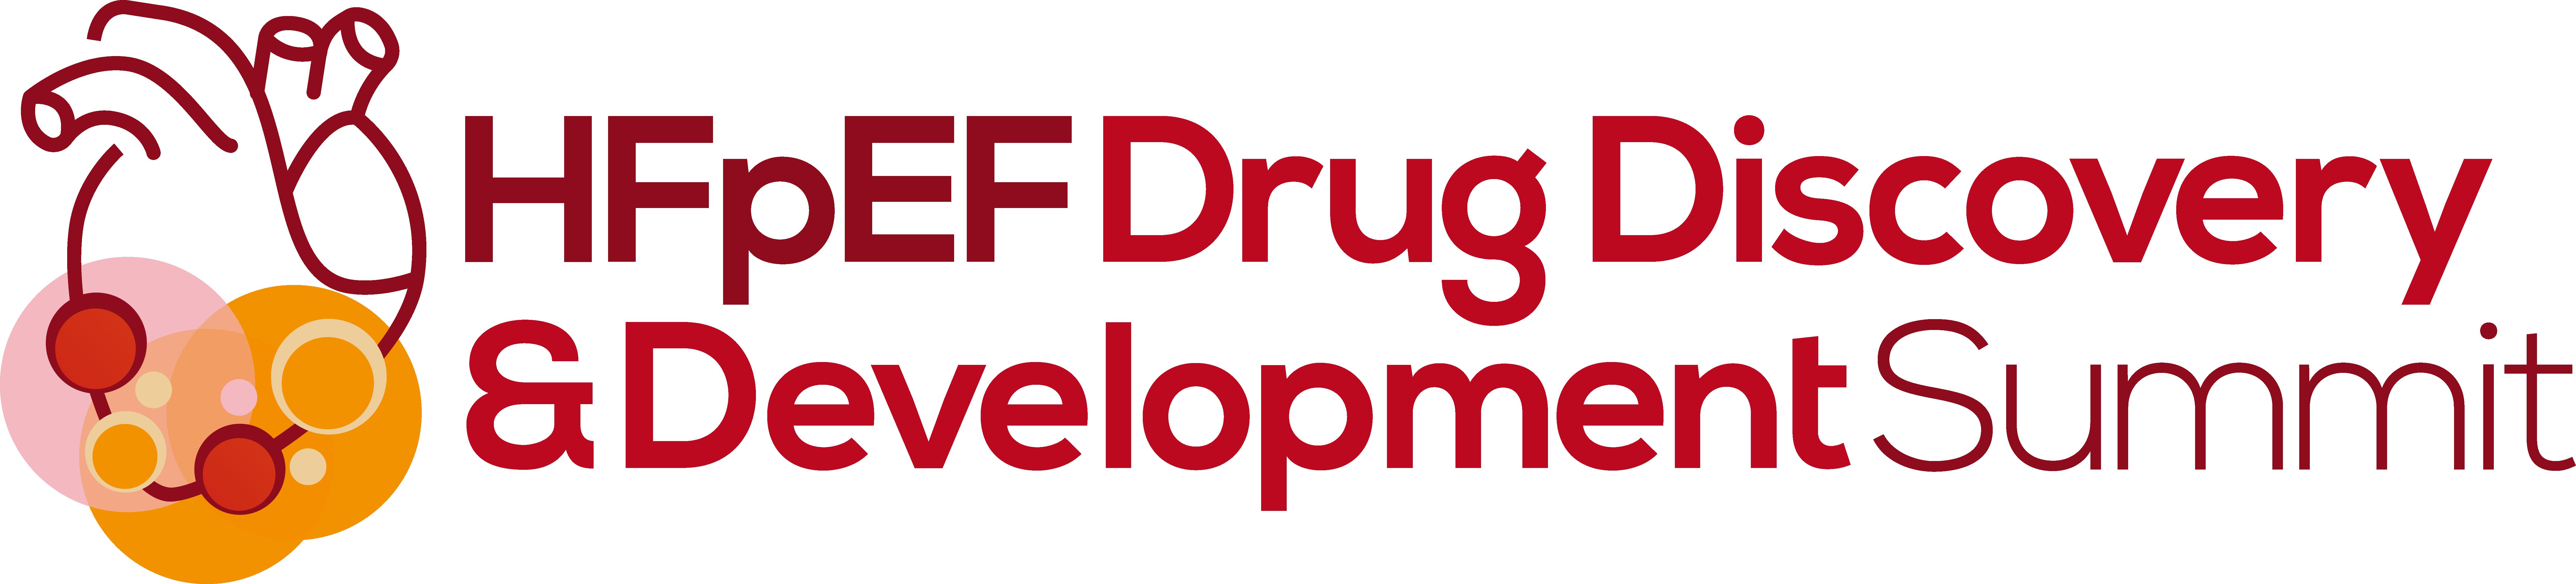 HW2100807 HFpEF Drug Discovery & amp Development logo FINAL - Copy